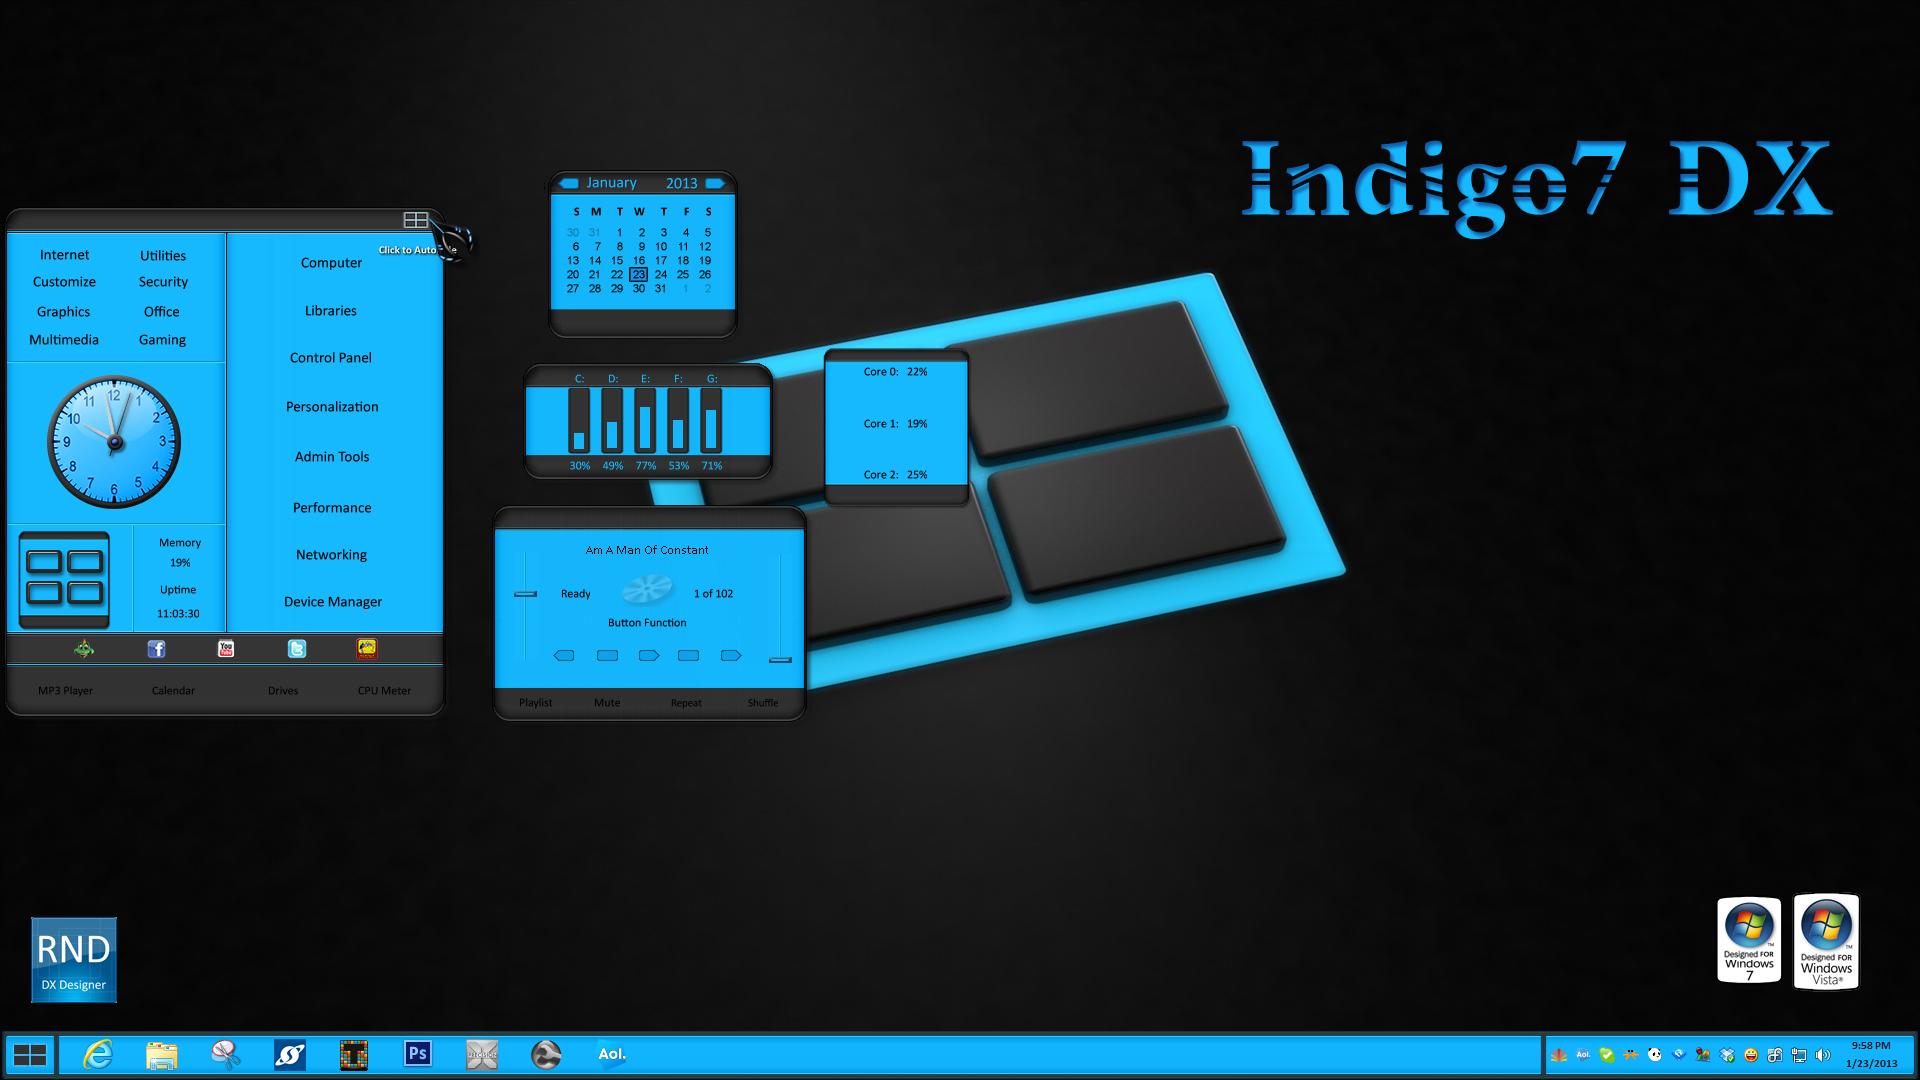 Indigo7 DX